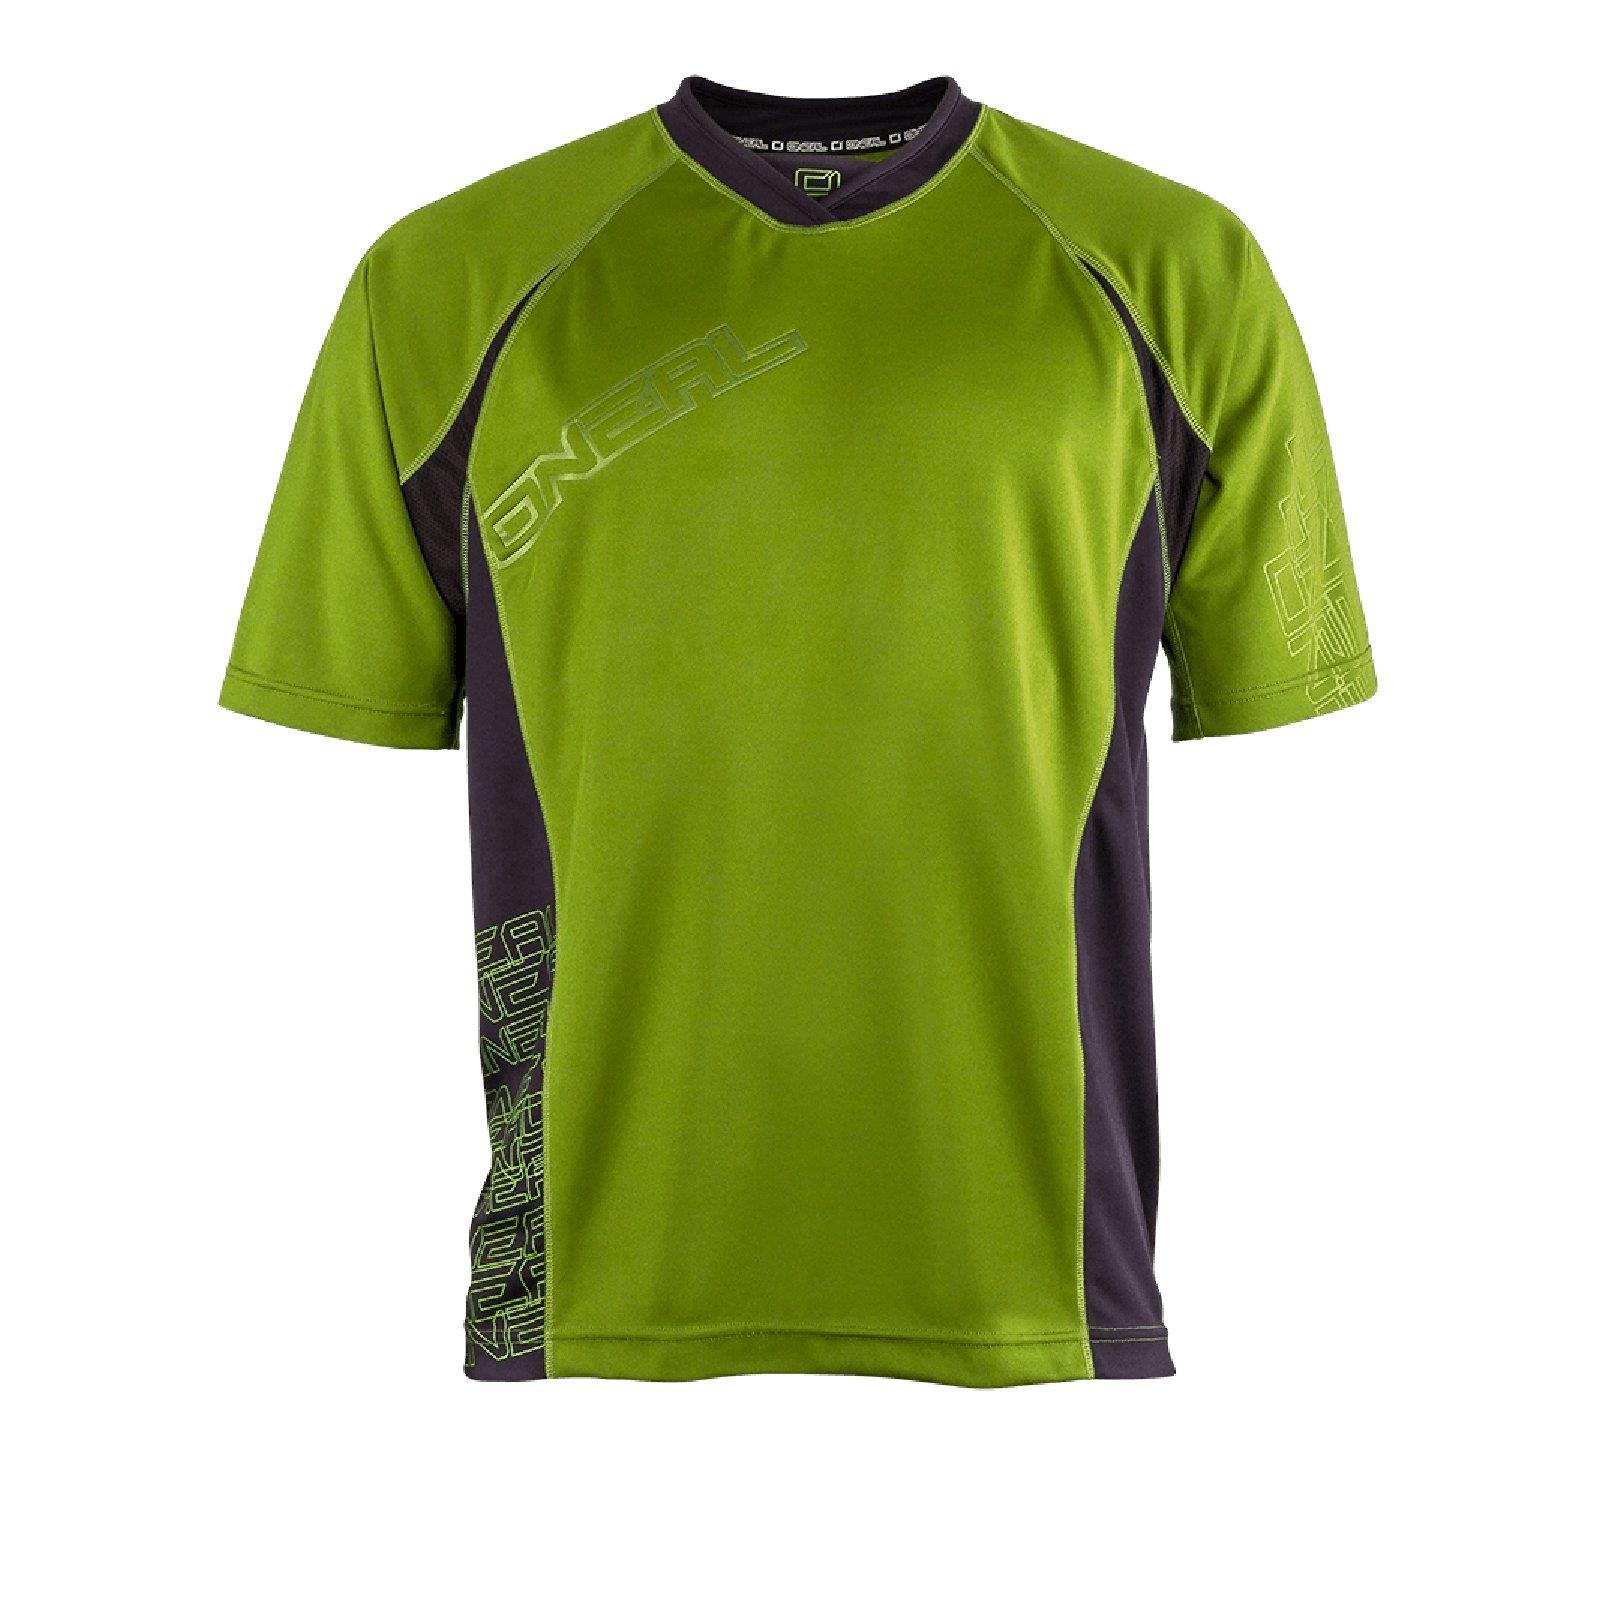 ONeal Pin It kurzarm Jersey Grün Trikot Fahrrad MTB DH FR Mountainbike Shirt